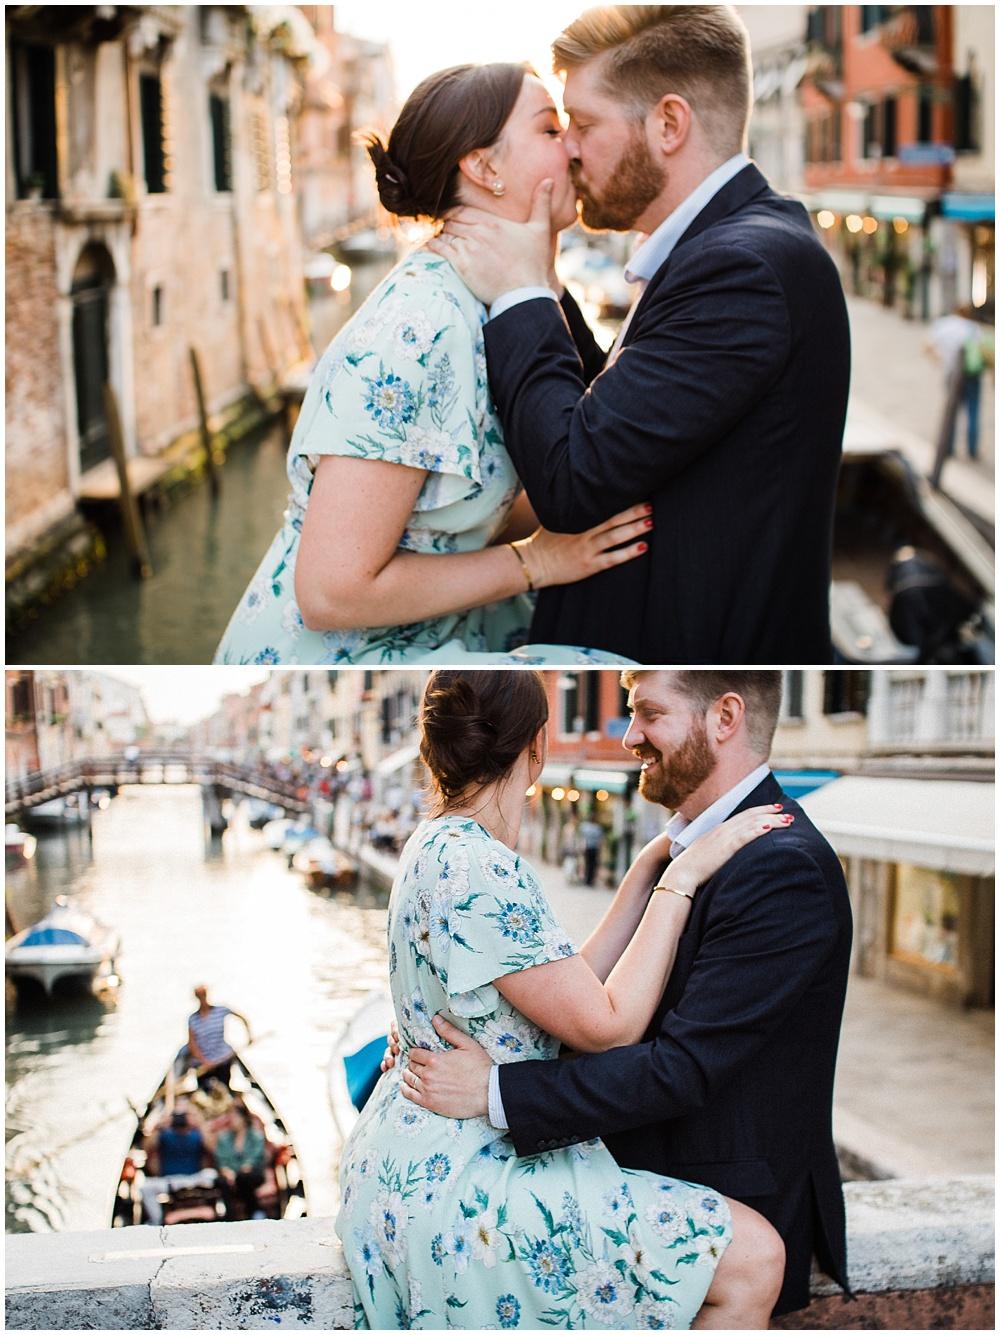 couple-photoshoot-venice-stefano-degirmenci_0222.jpg